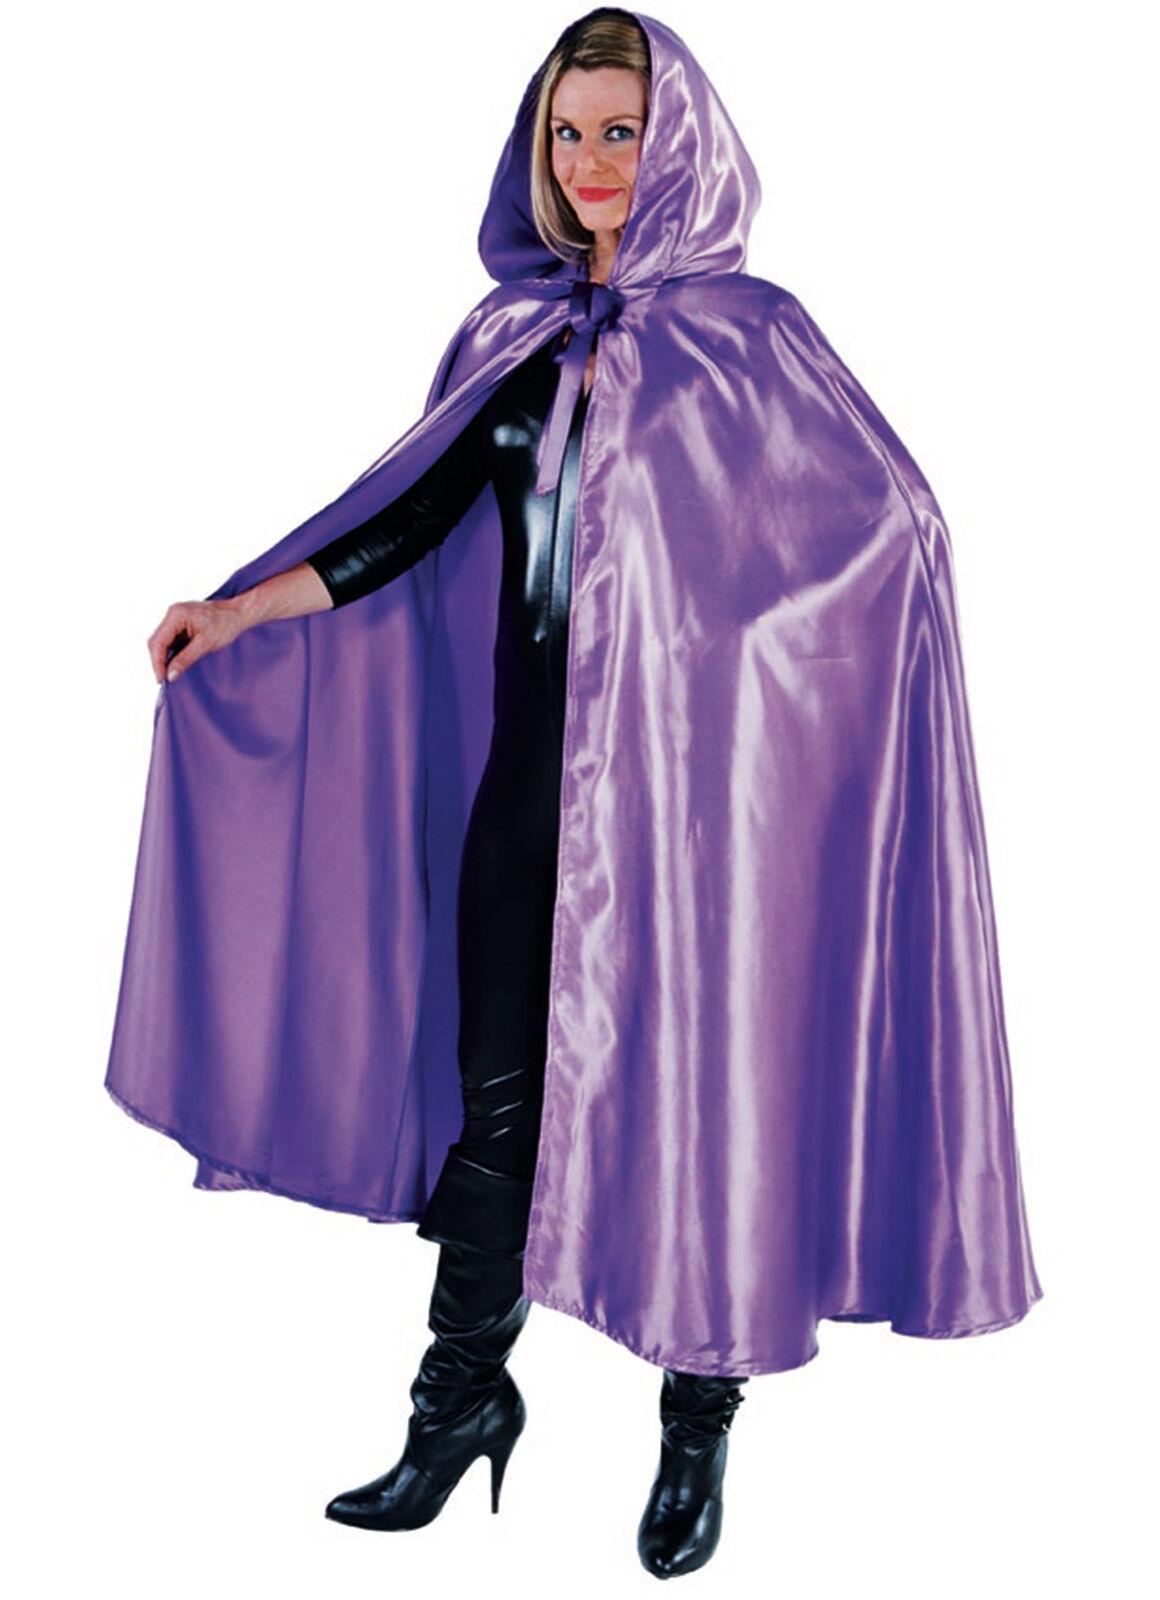 Deluxe PURPLE Satin Hooded Cloak/Cape - GOTHIC / WEDDING ETC